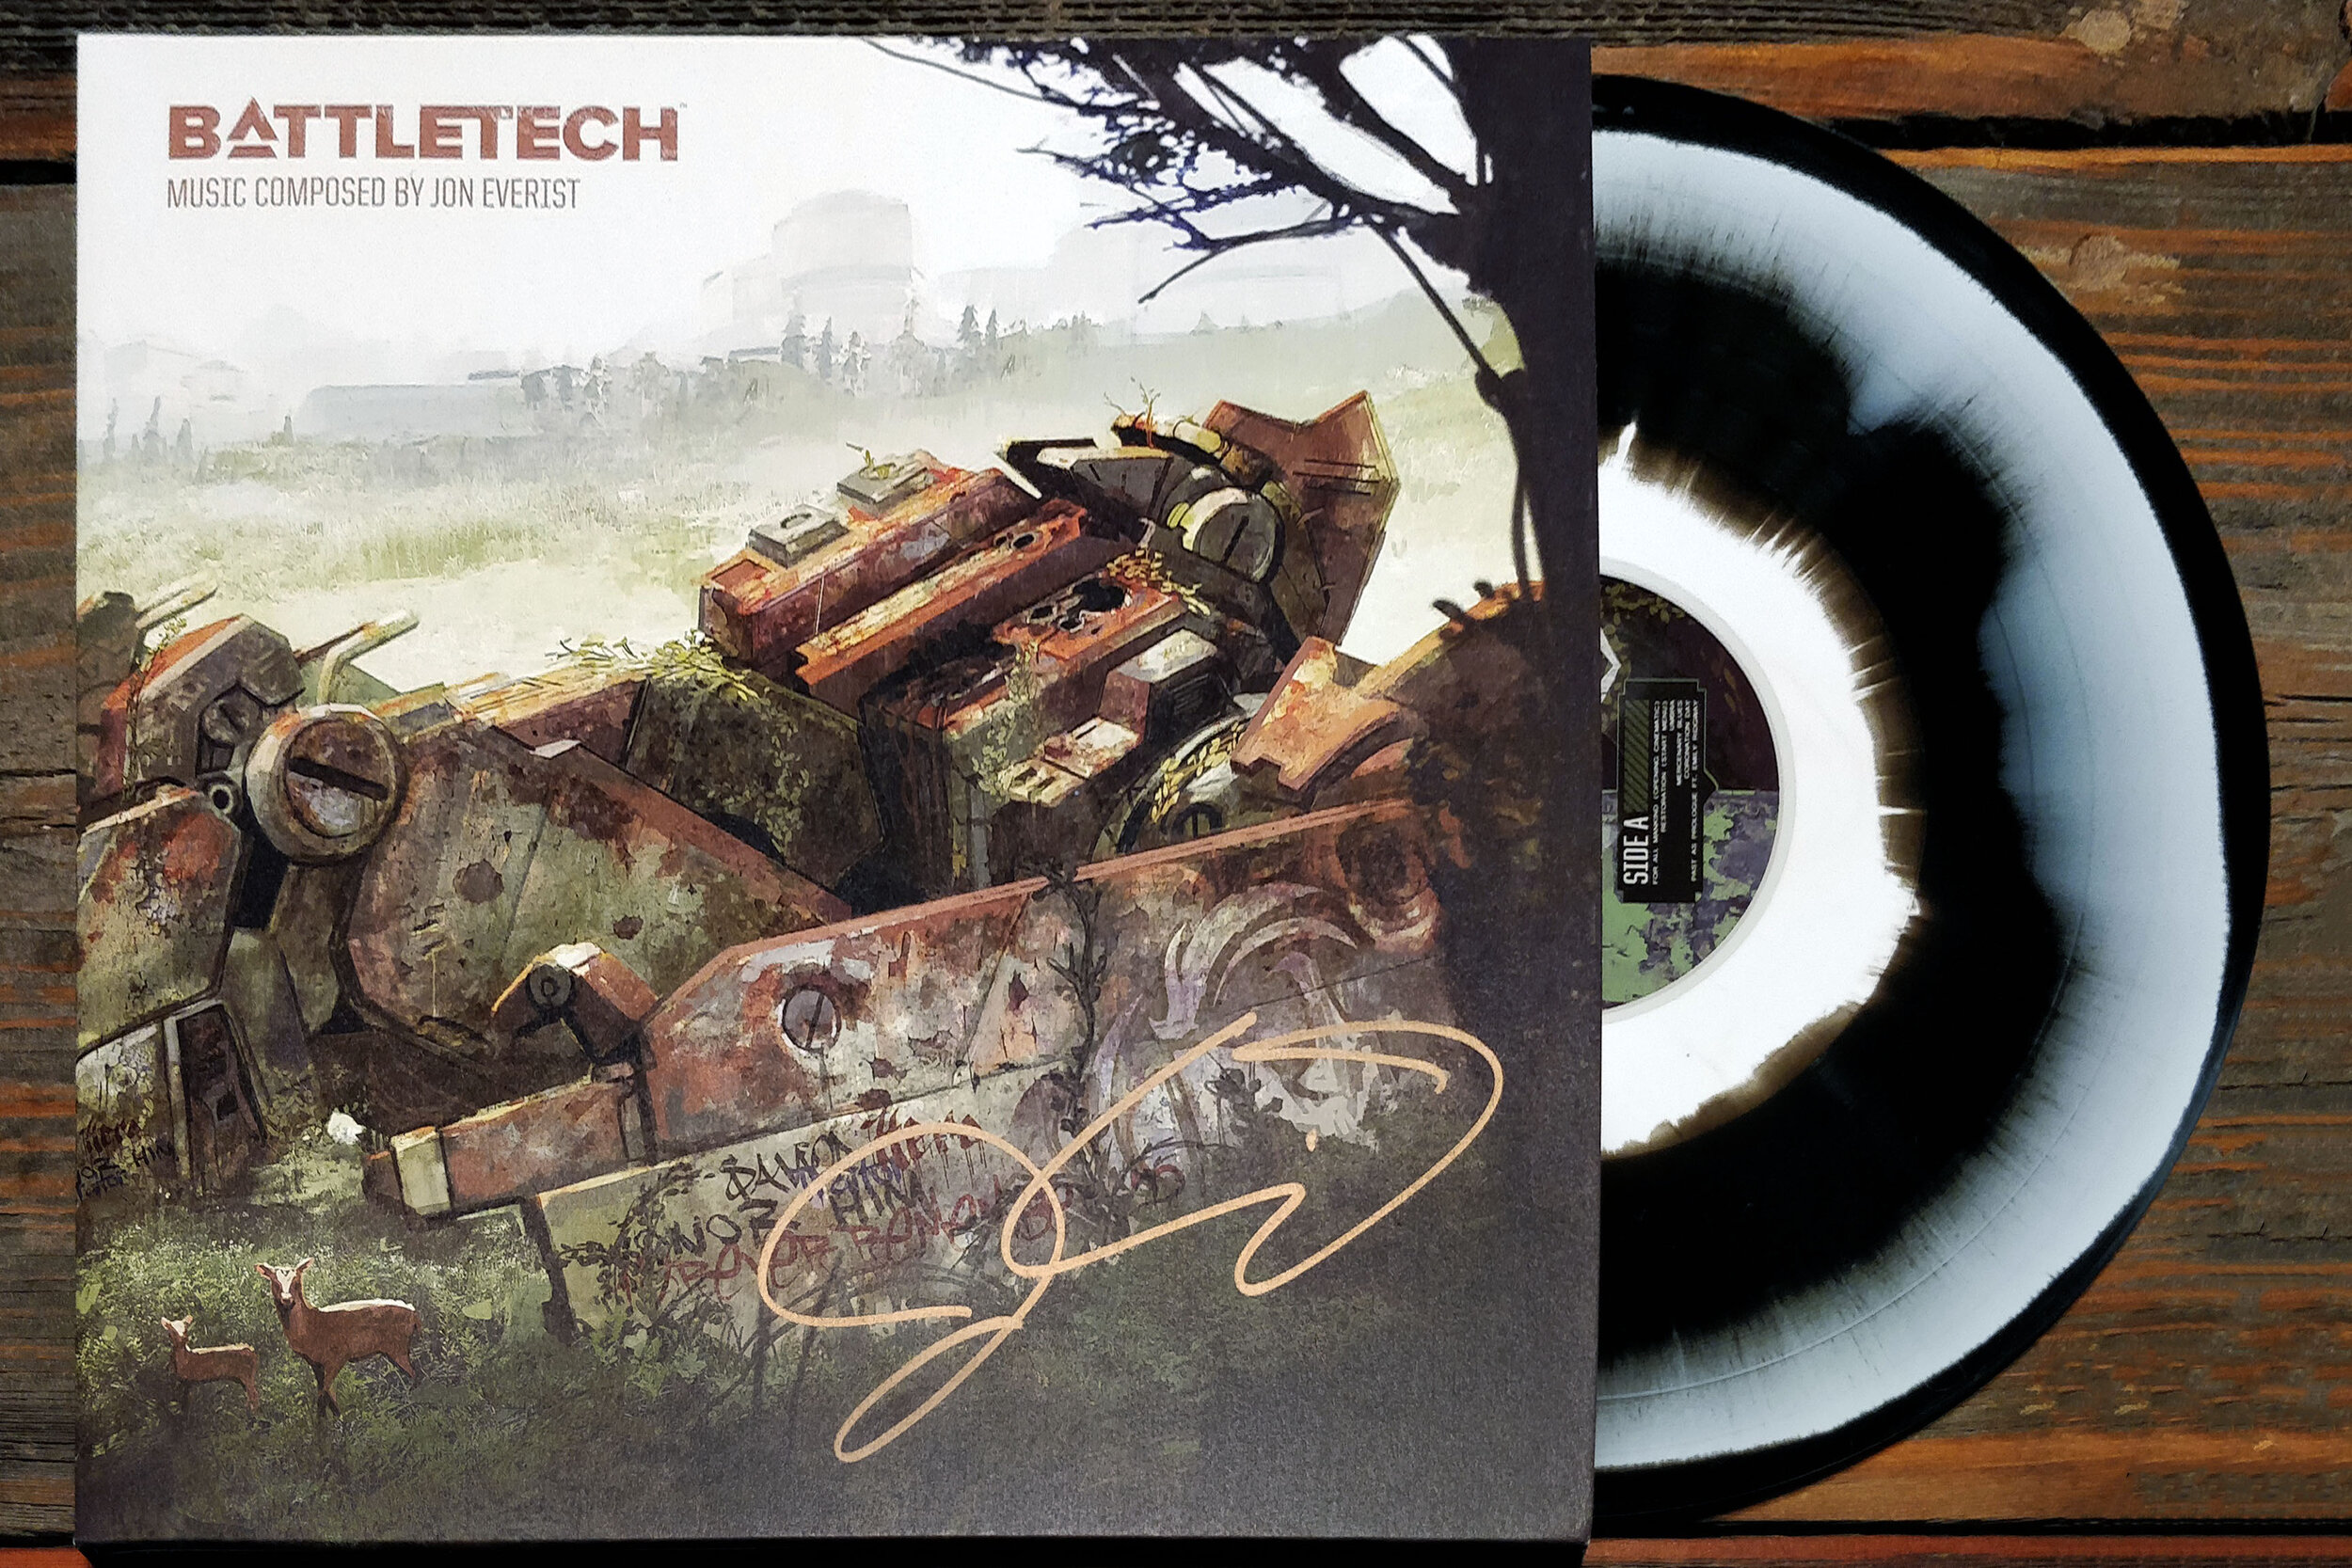 BattleTech by Jon Everist pressed on black/white ink spot vinyl by Black Screen Records